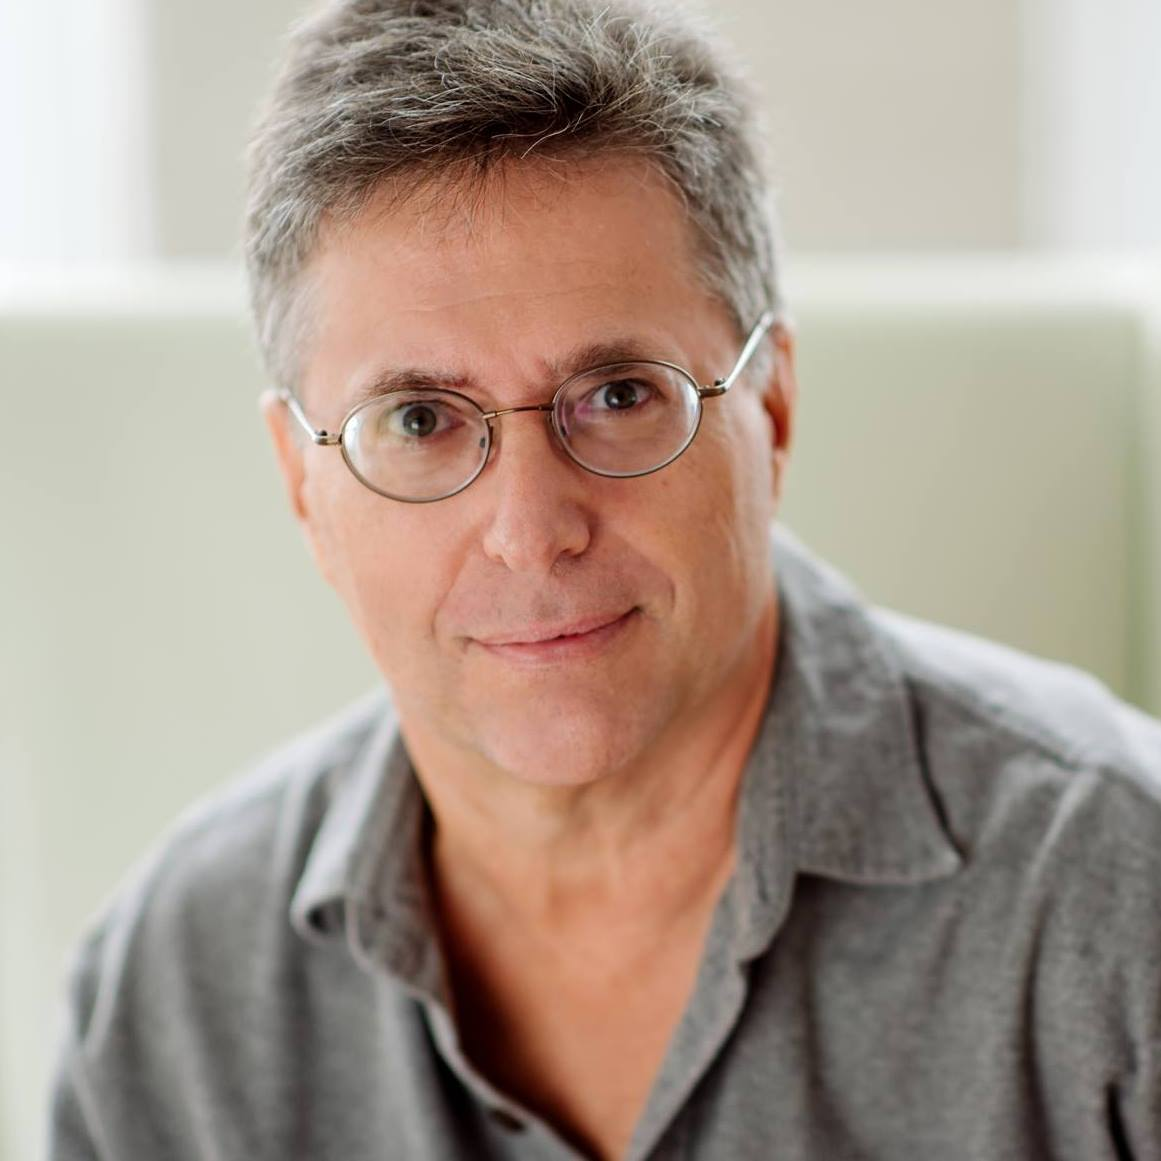 Jim Molinelli, PhD